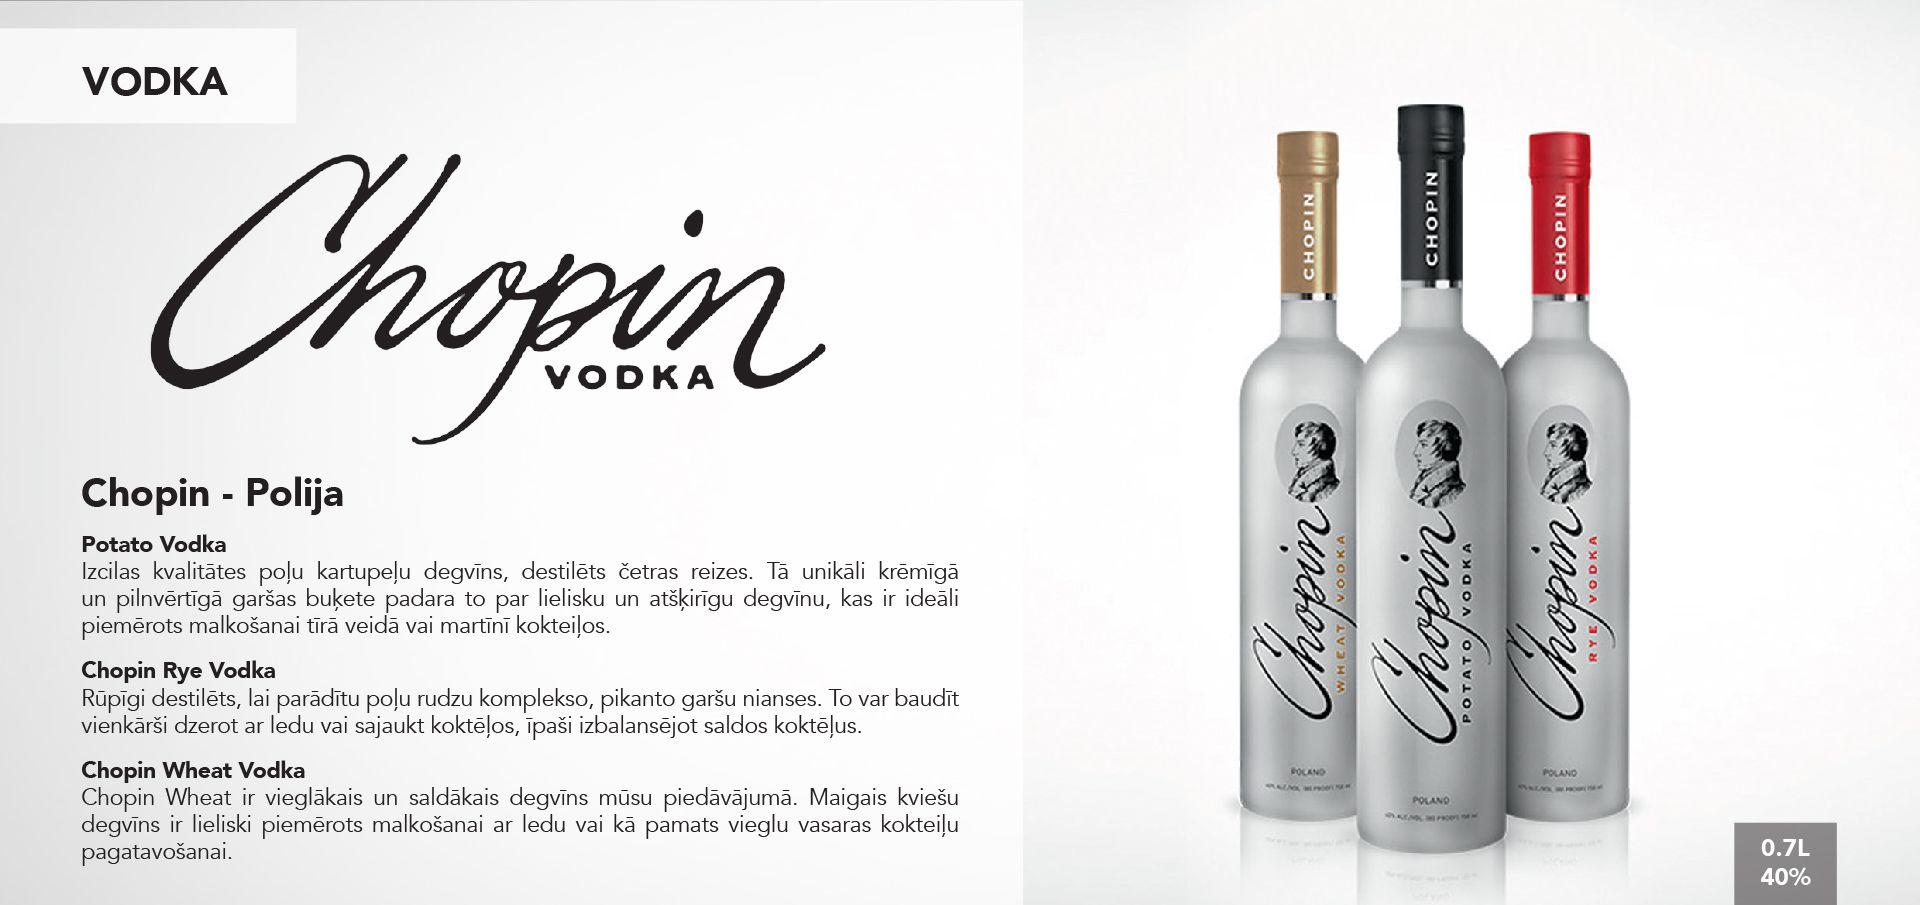 Chopin Vodka - Polija